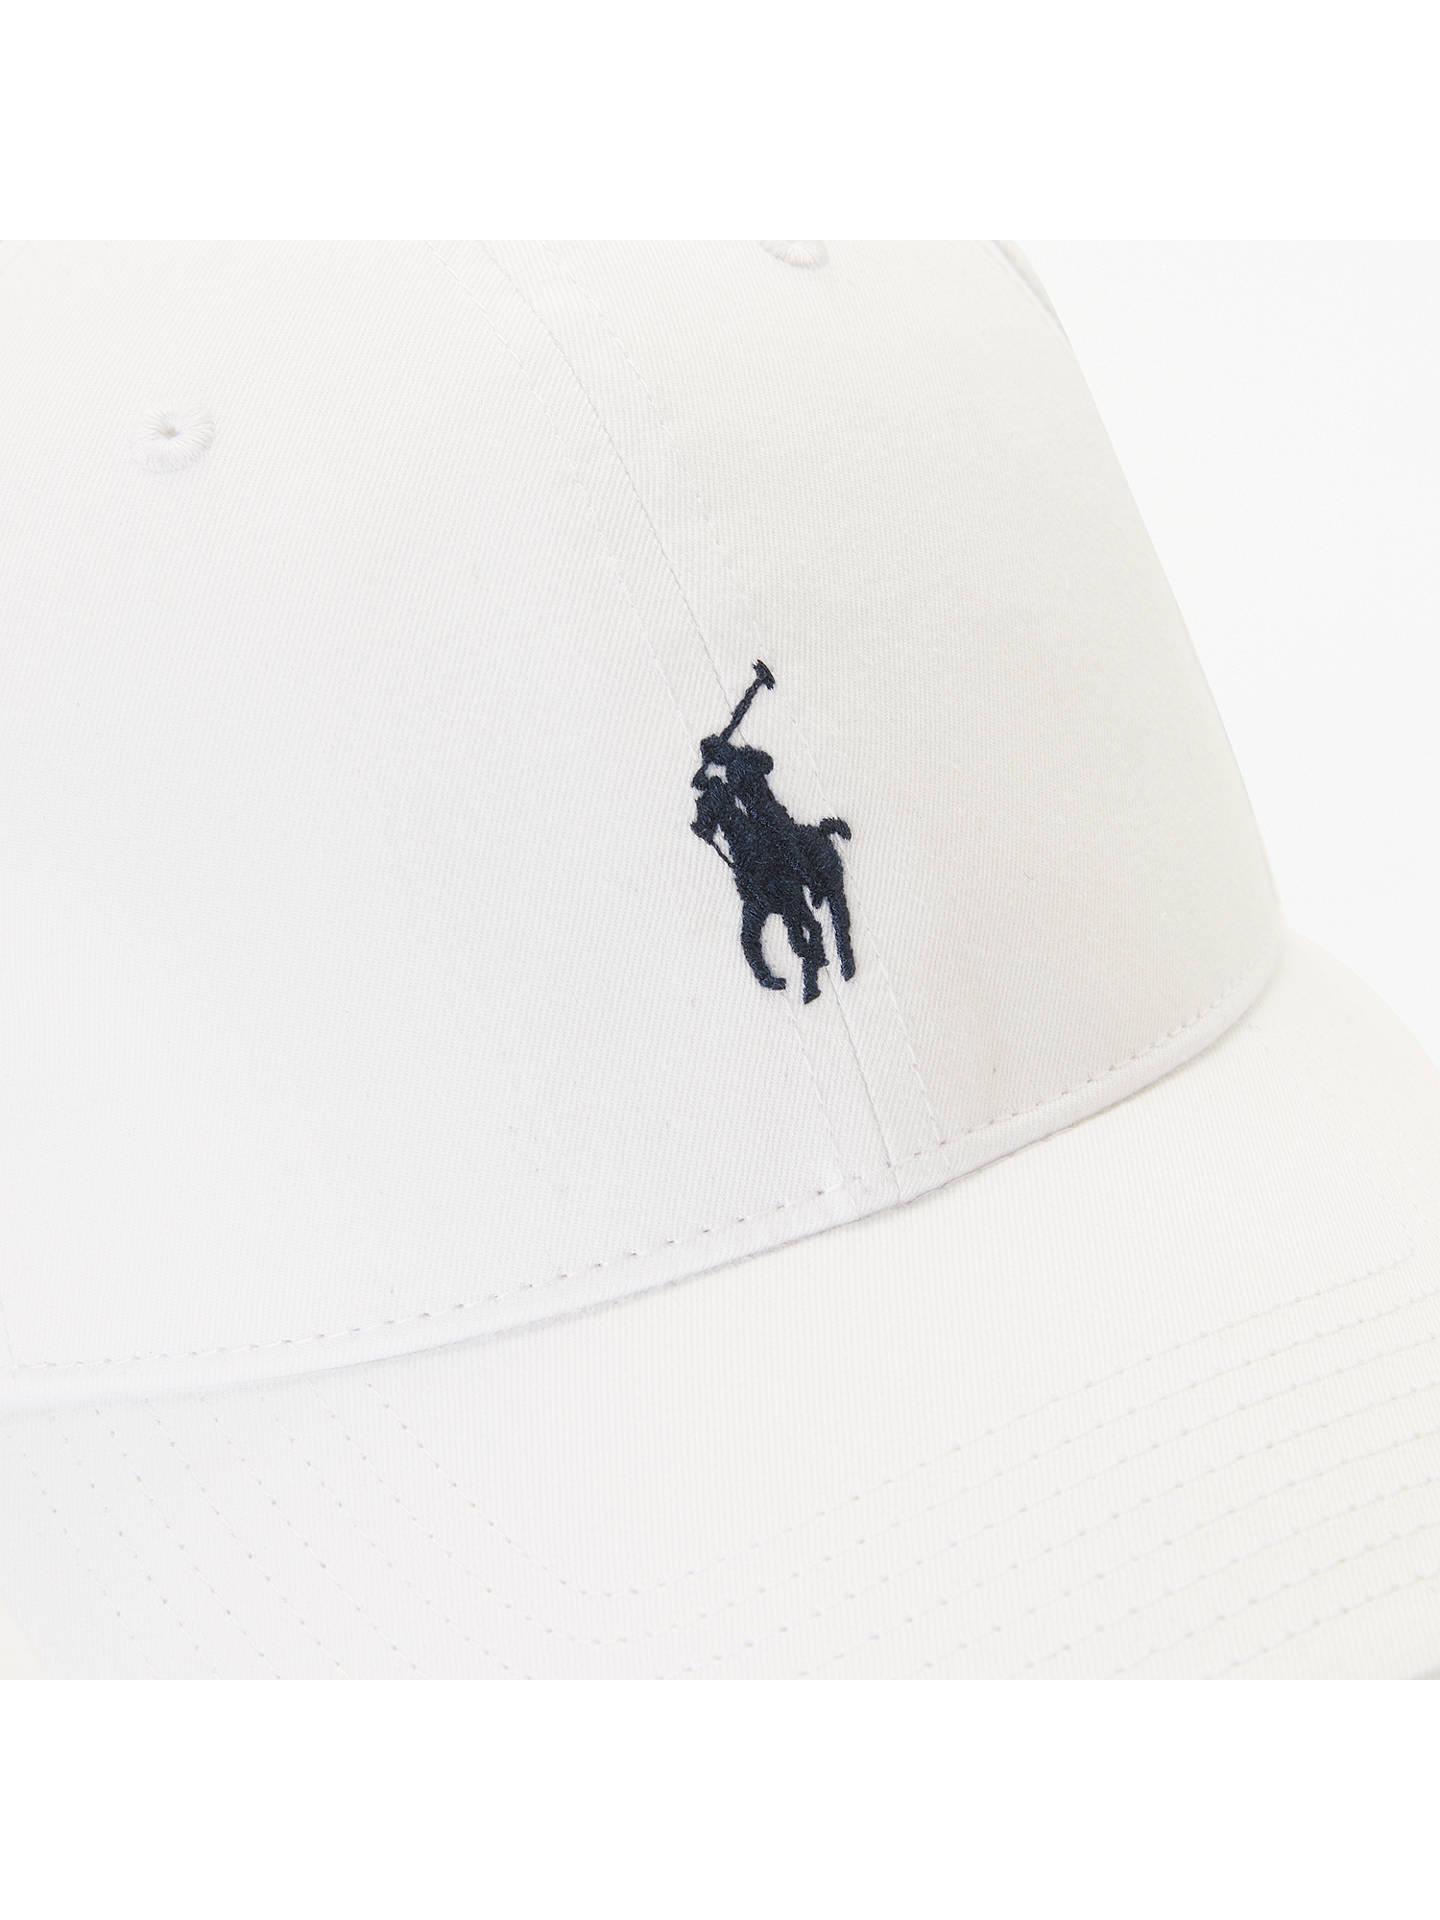 4d1de8de69f Polo Golf By Ralph Lauren Fairway Cap at John Lewis   Partners